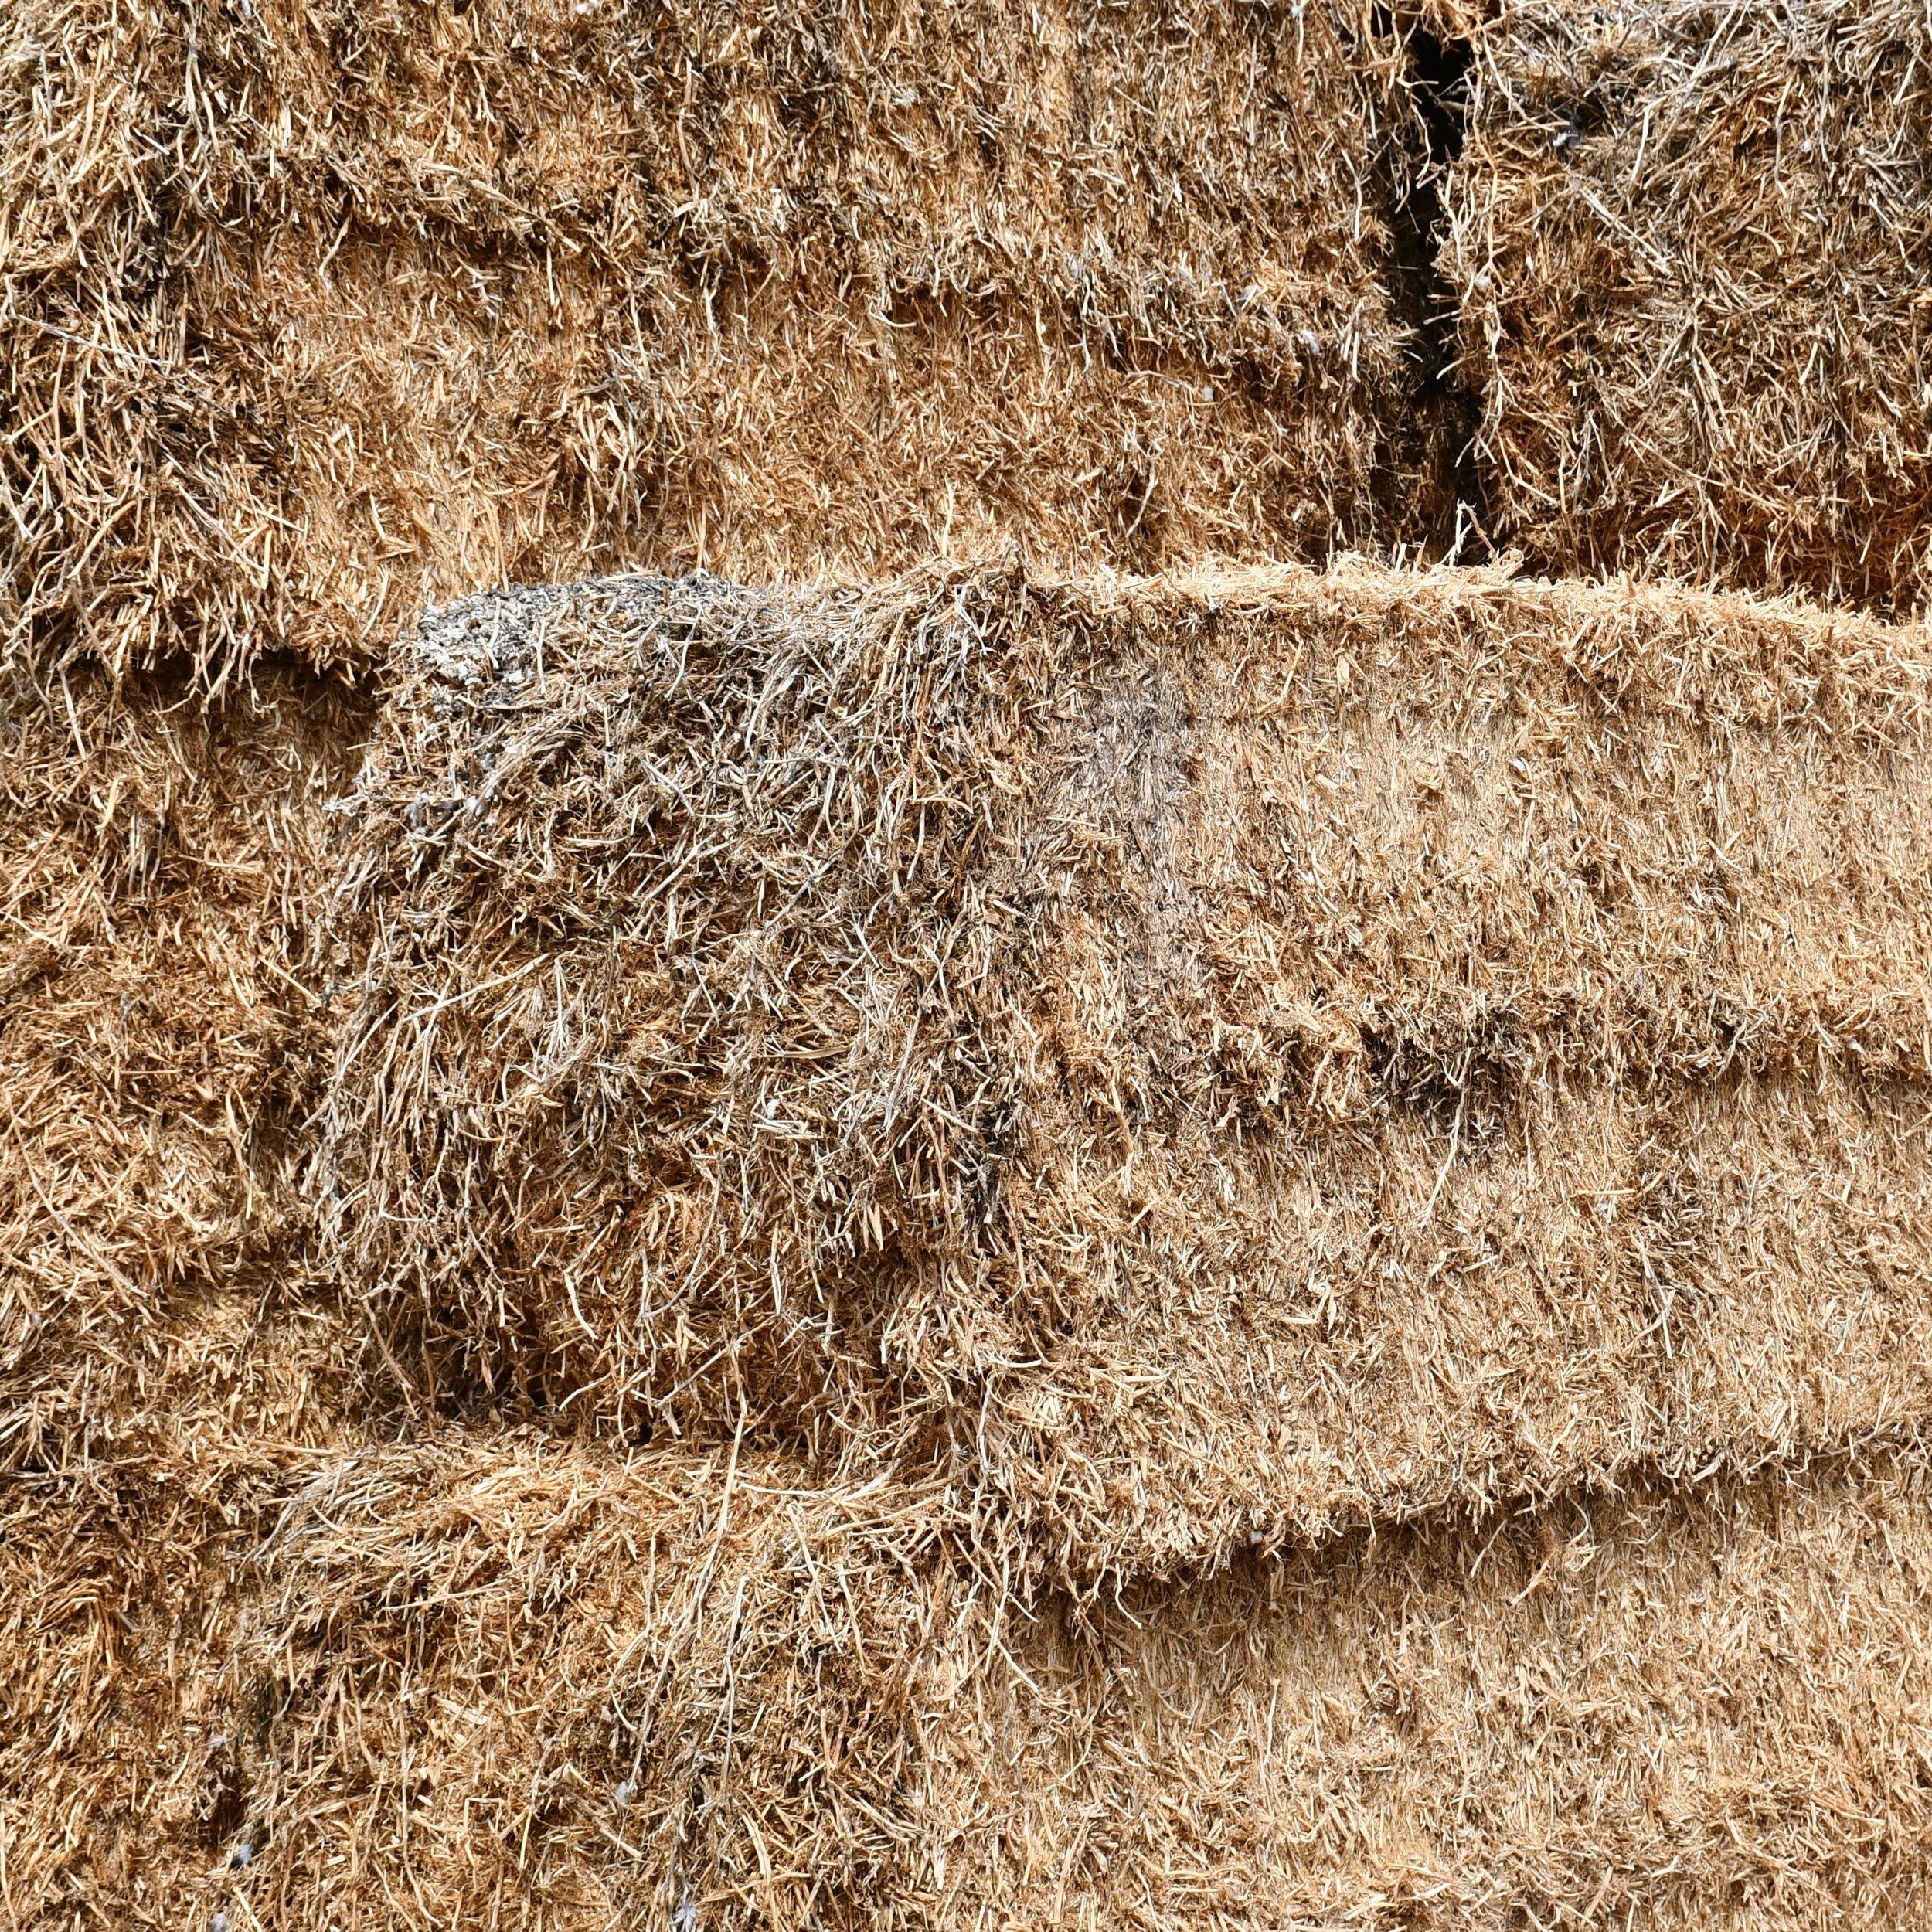 Pea & Barley Straw